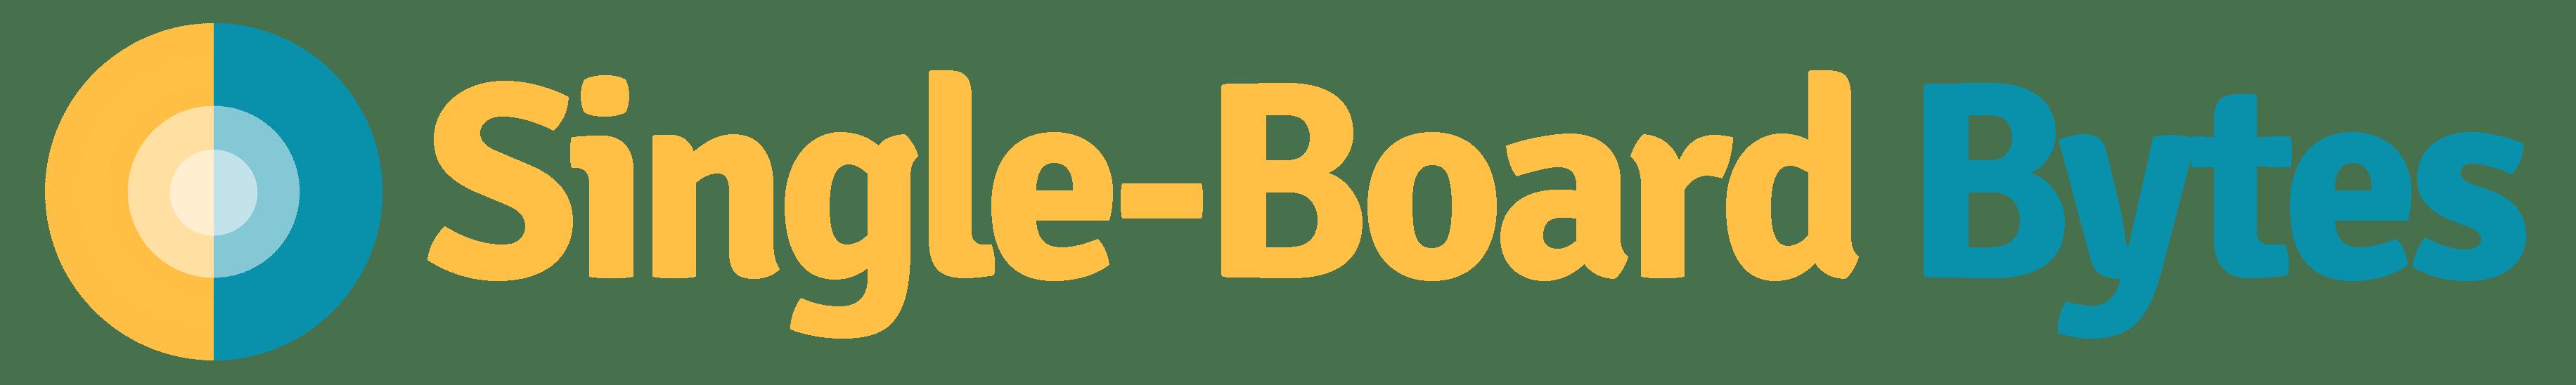 Single Board Bytes